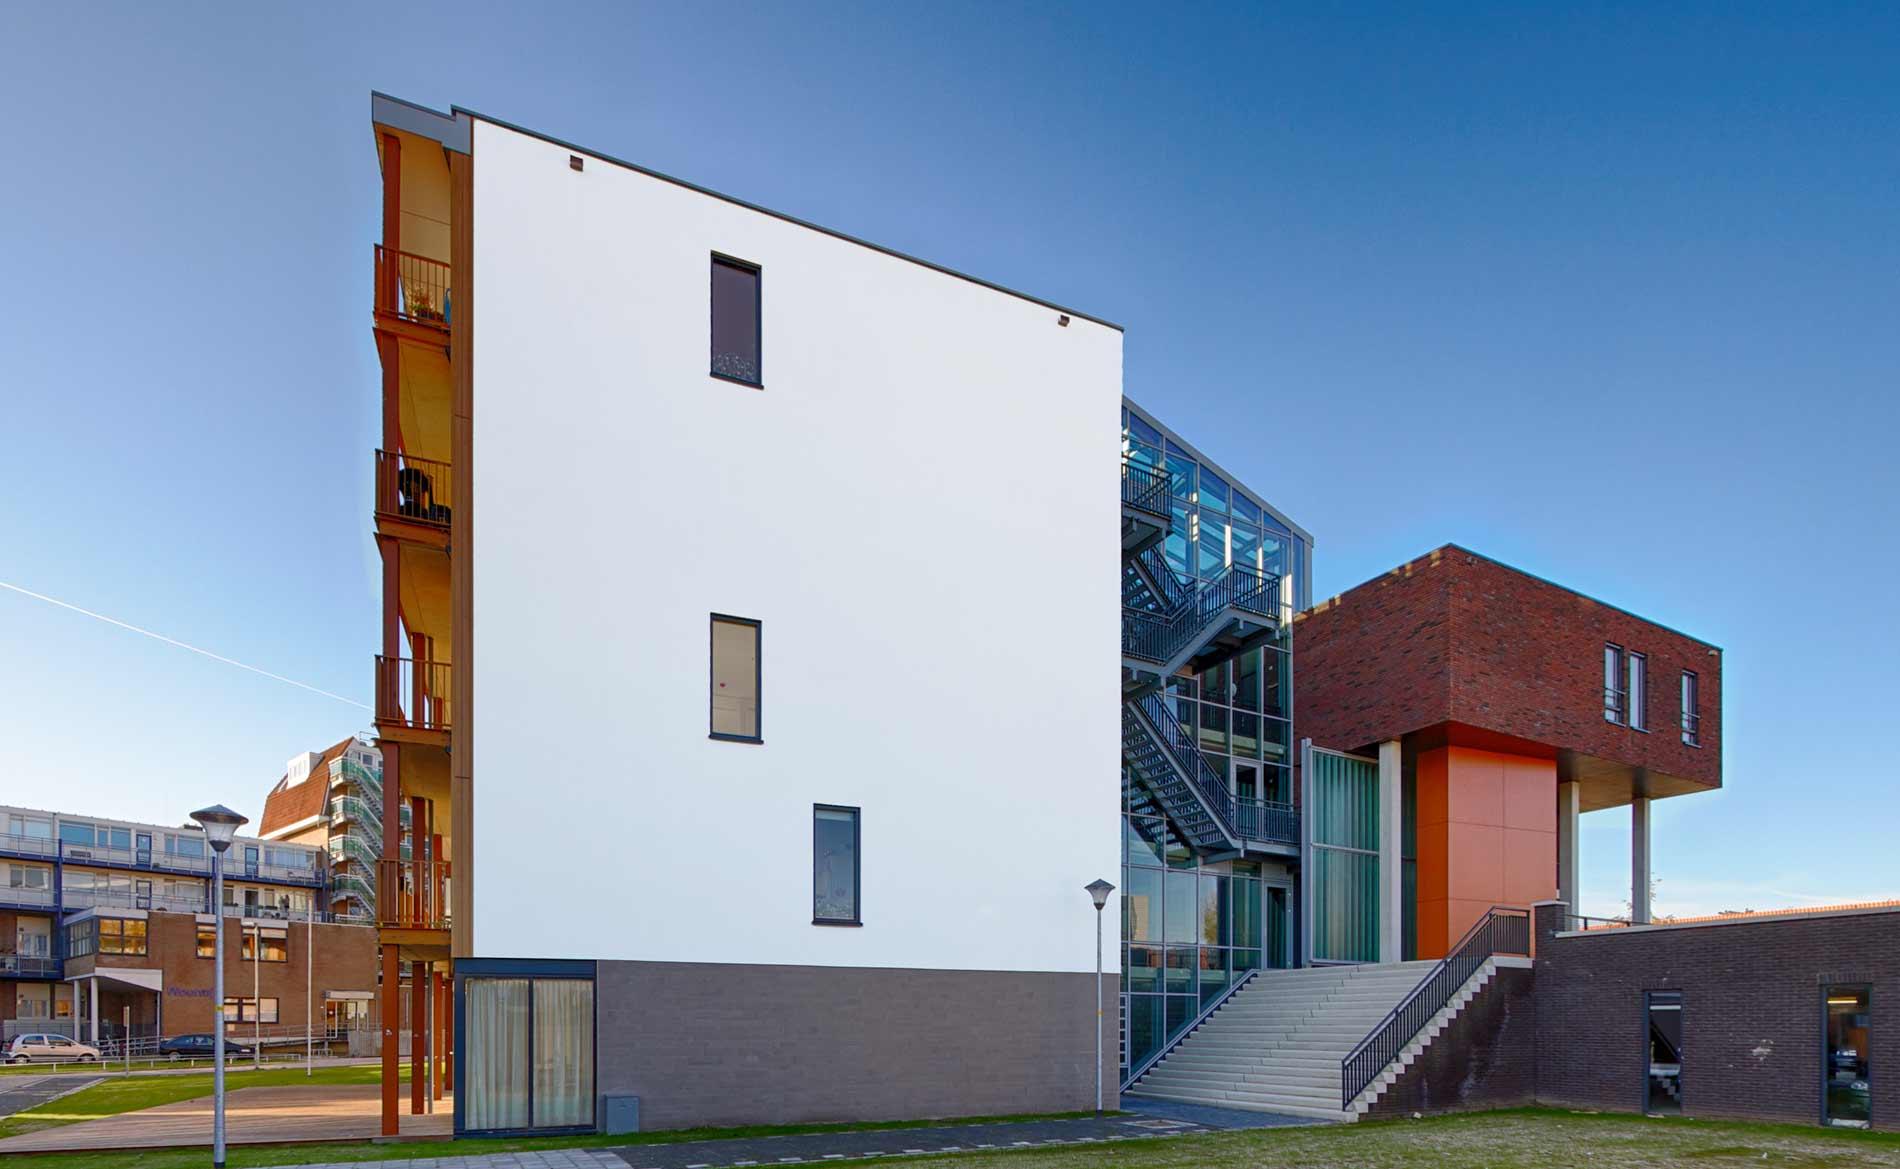 architect seniorenappartementen woningbouw Indische ouderen herstructurering centrum parkeergarage Tjempaka Den Helder BBHD architecten